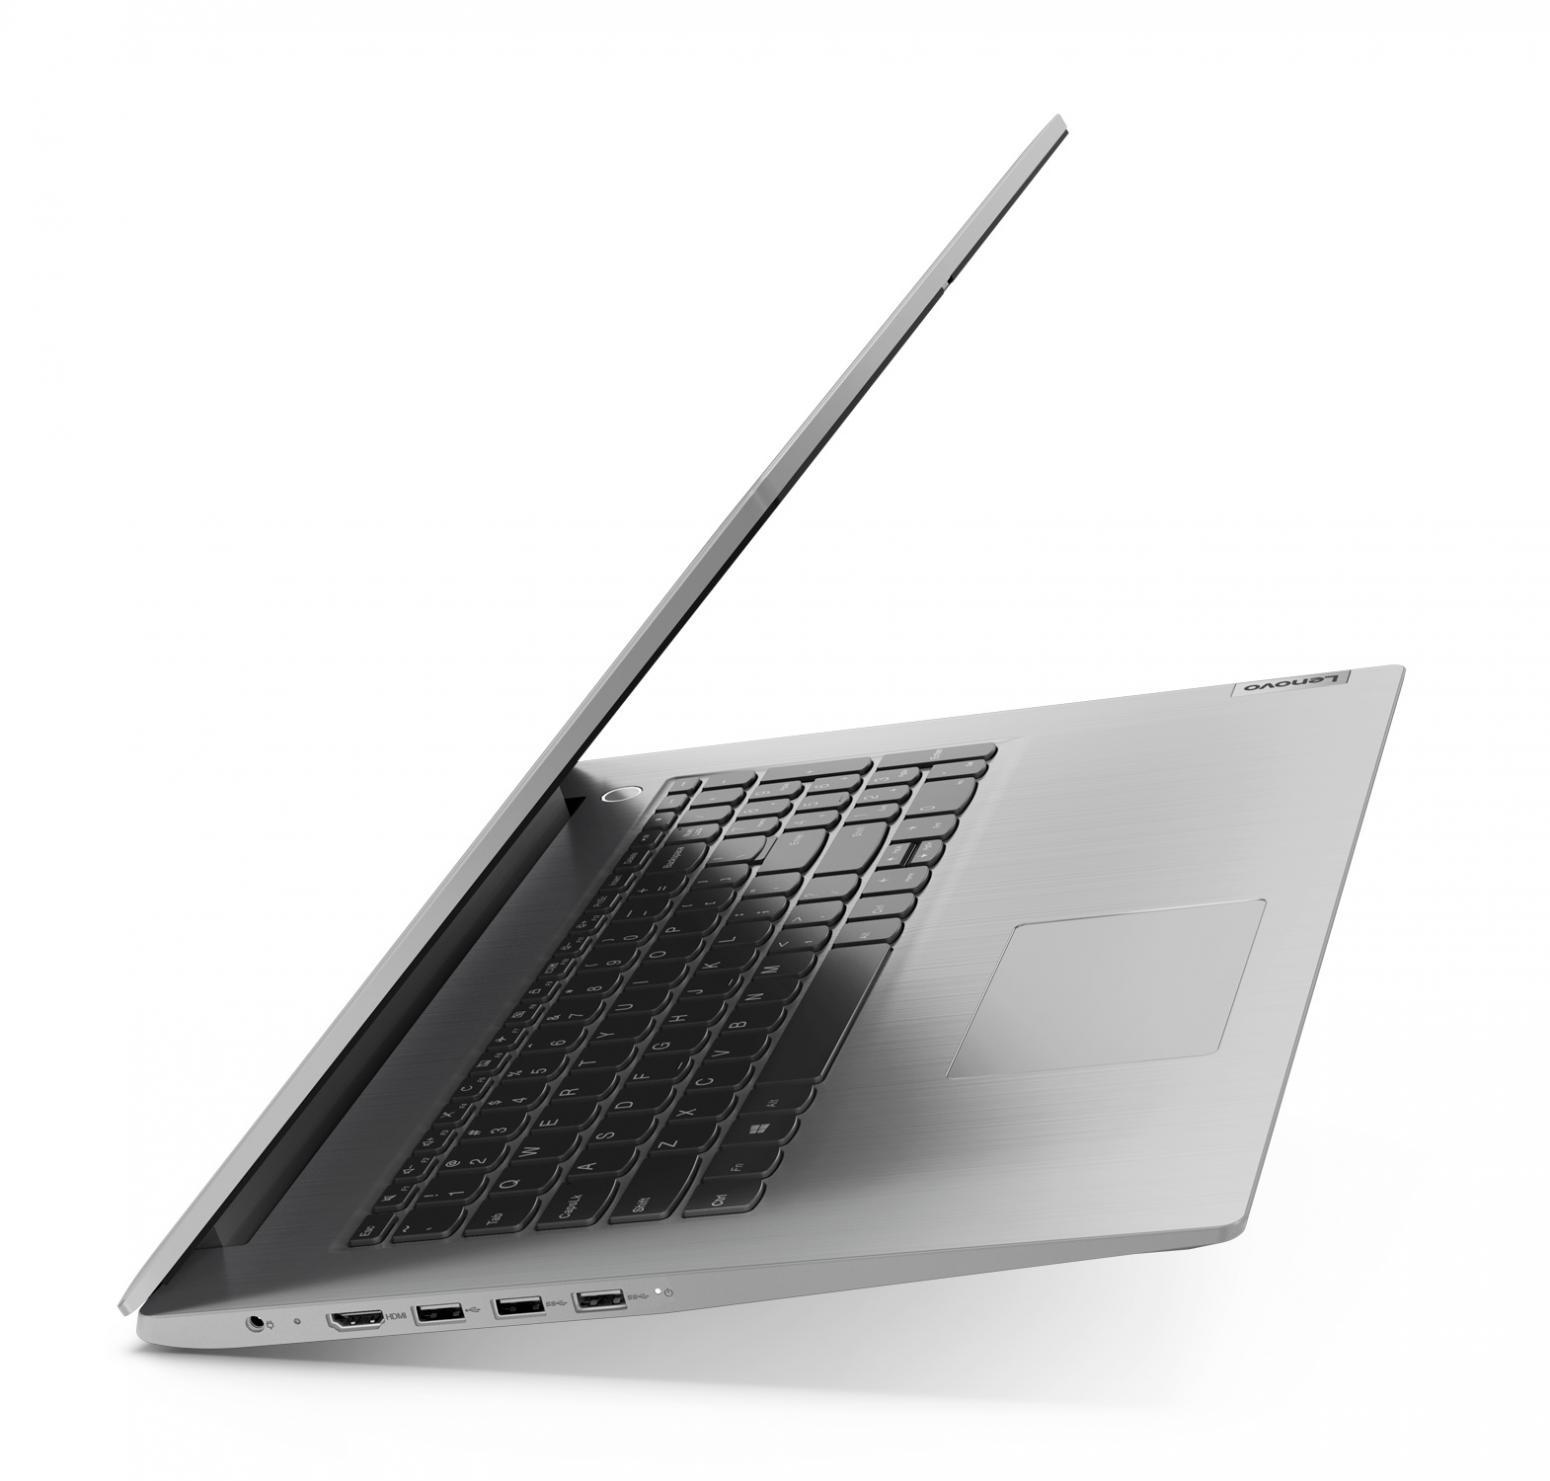 Ordinateur portable Lenovo IdeaPad 3 17ADA05-931 (81W2000UFR) Argent - photo 7